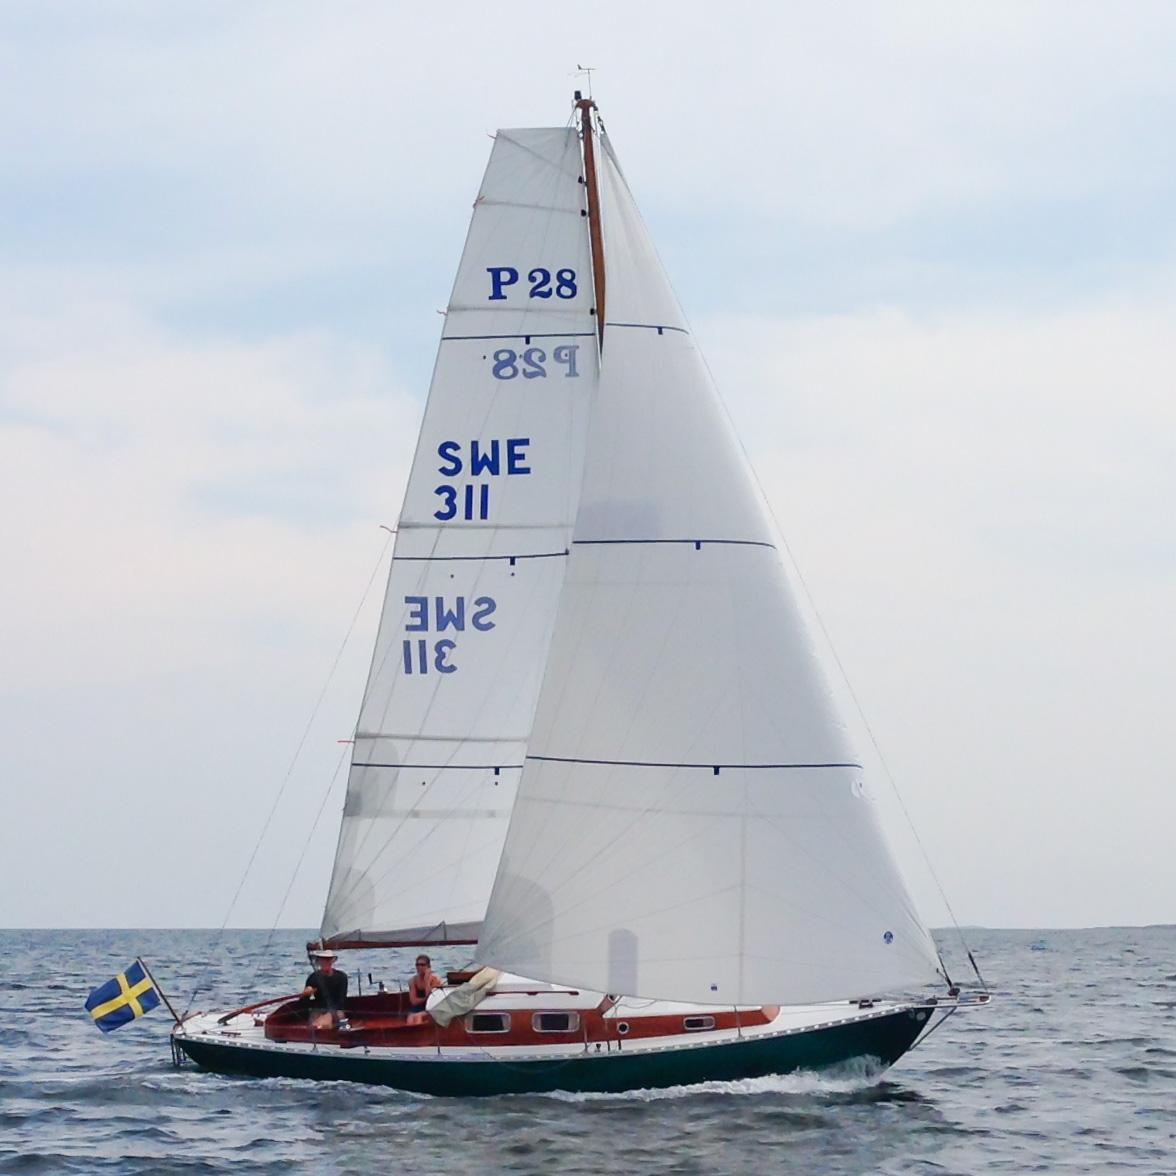 P28 Turbo Ingeborg